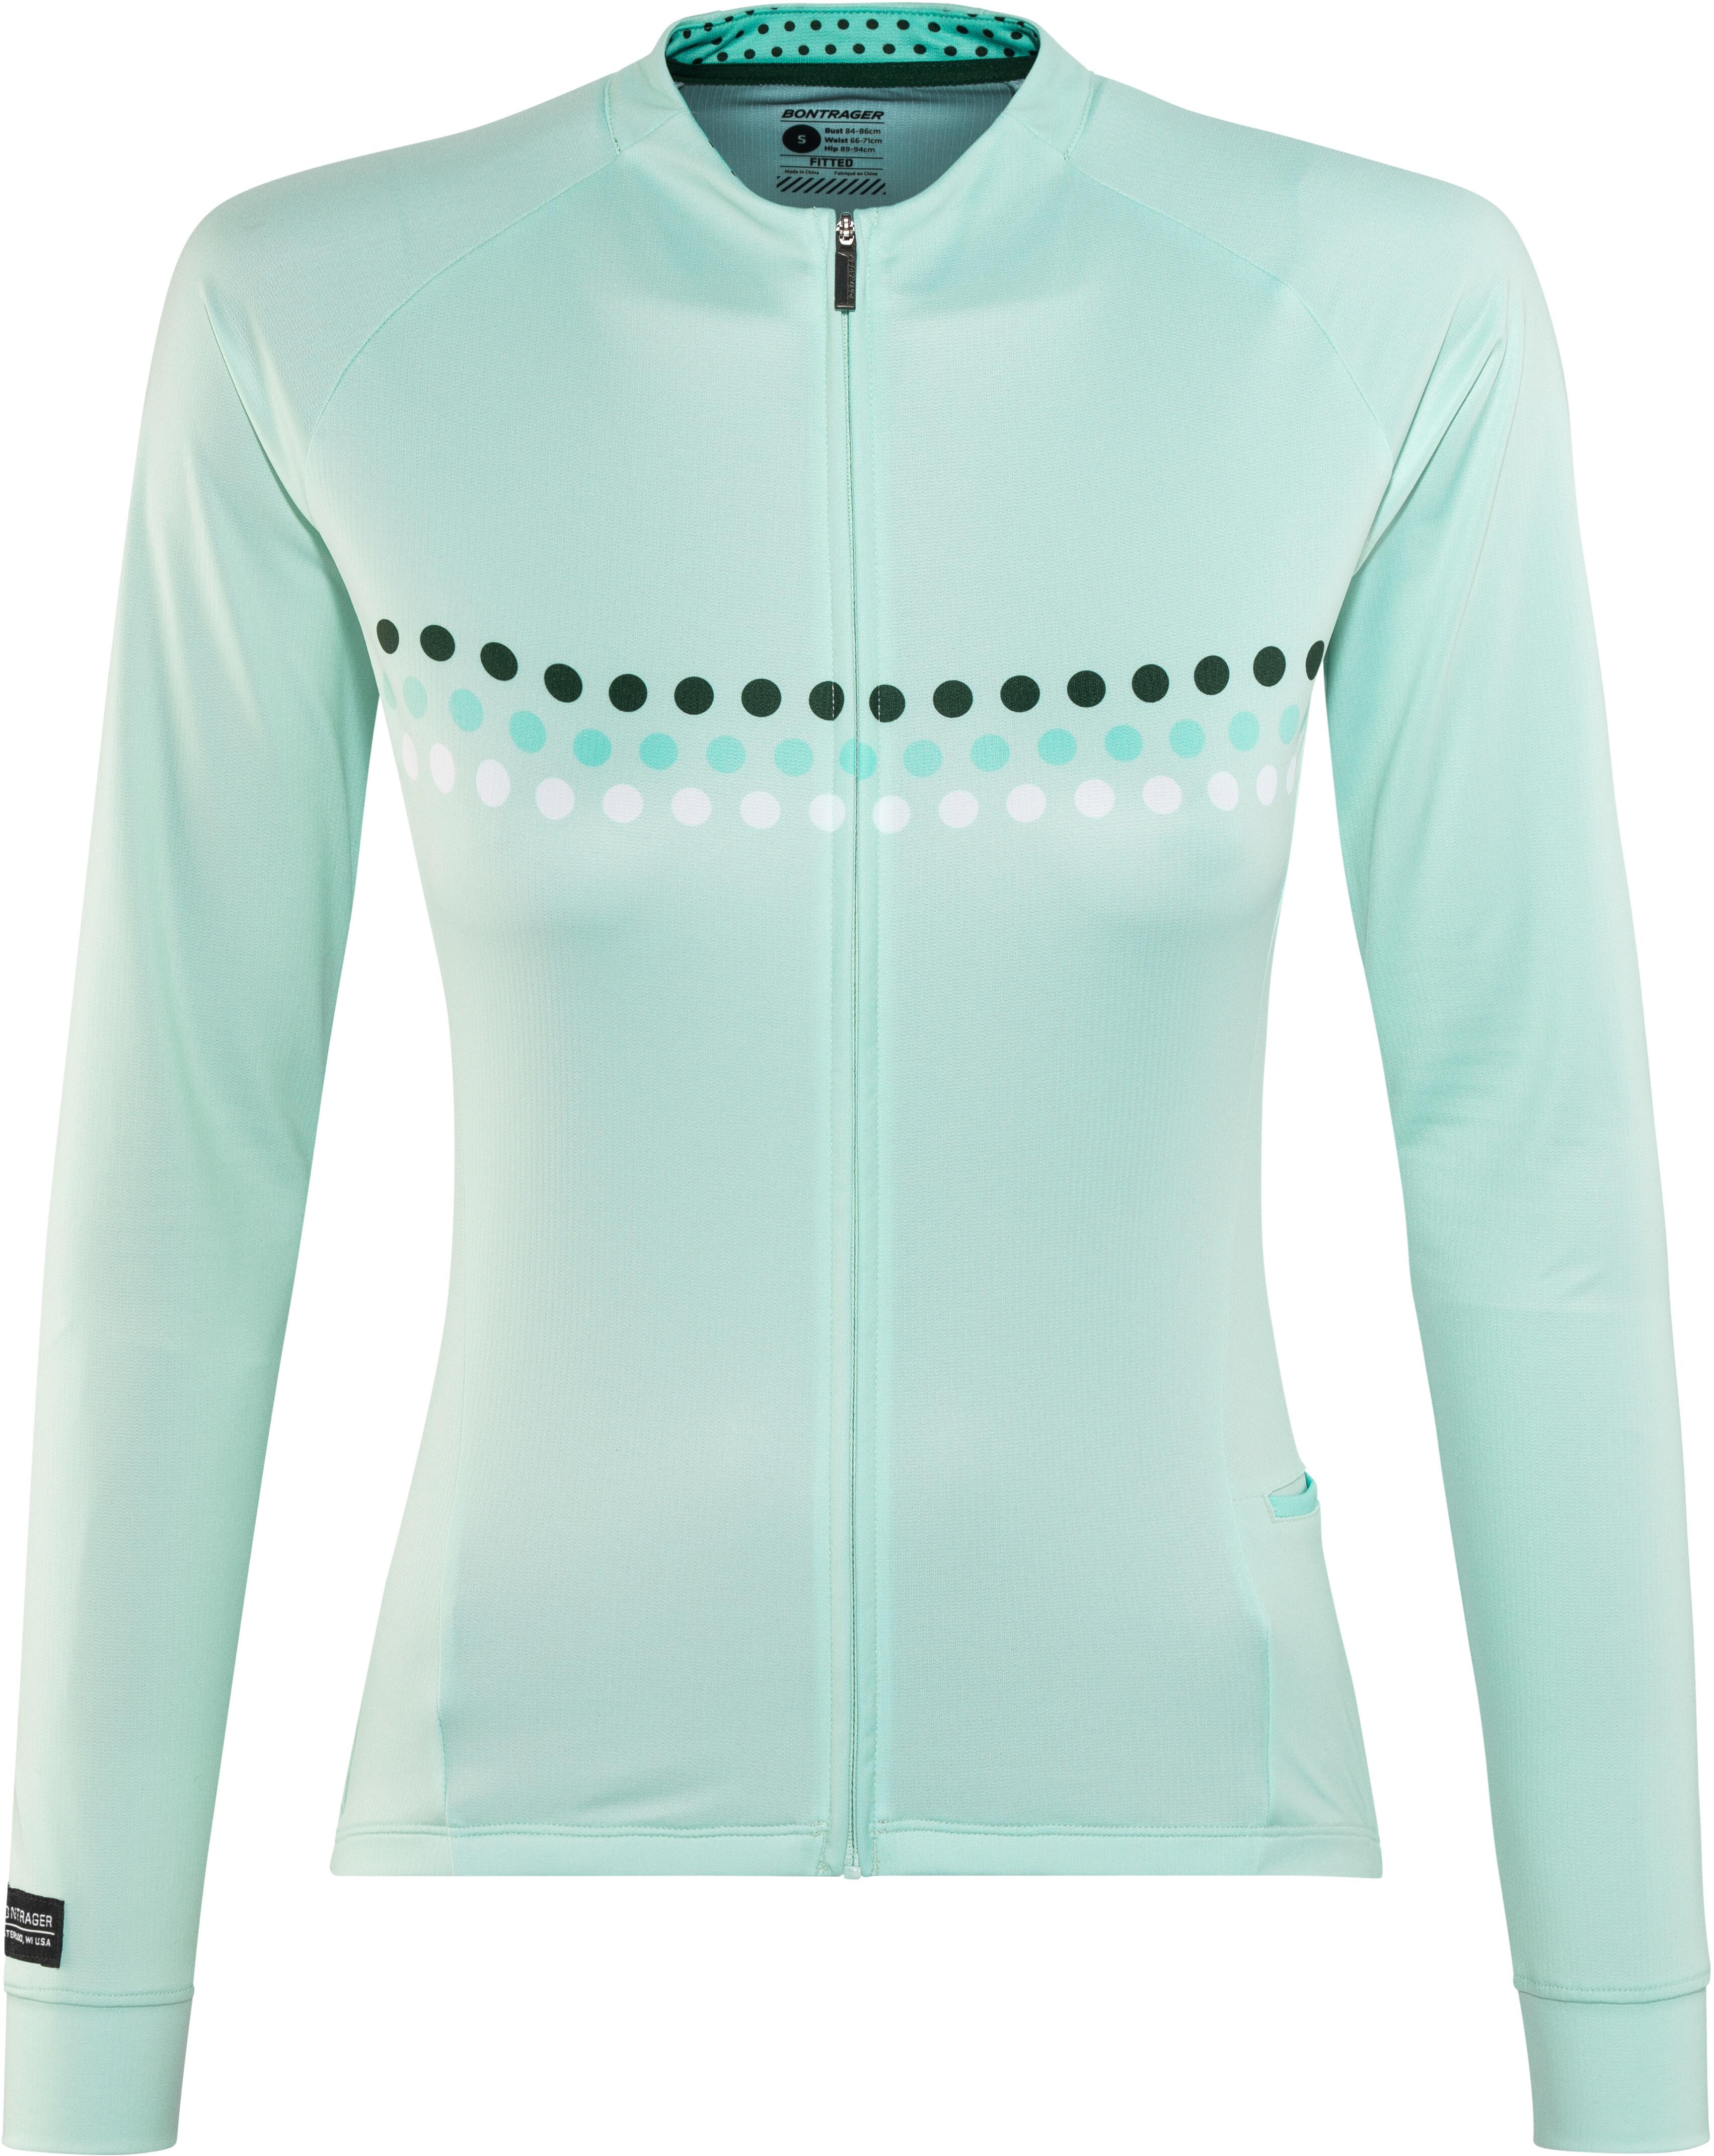 dd33e1def Bontrager Circuit Cycling Bike Jersey Longsleeve Women blue at ...